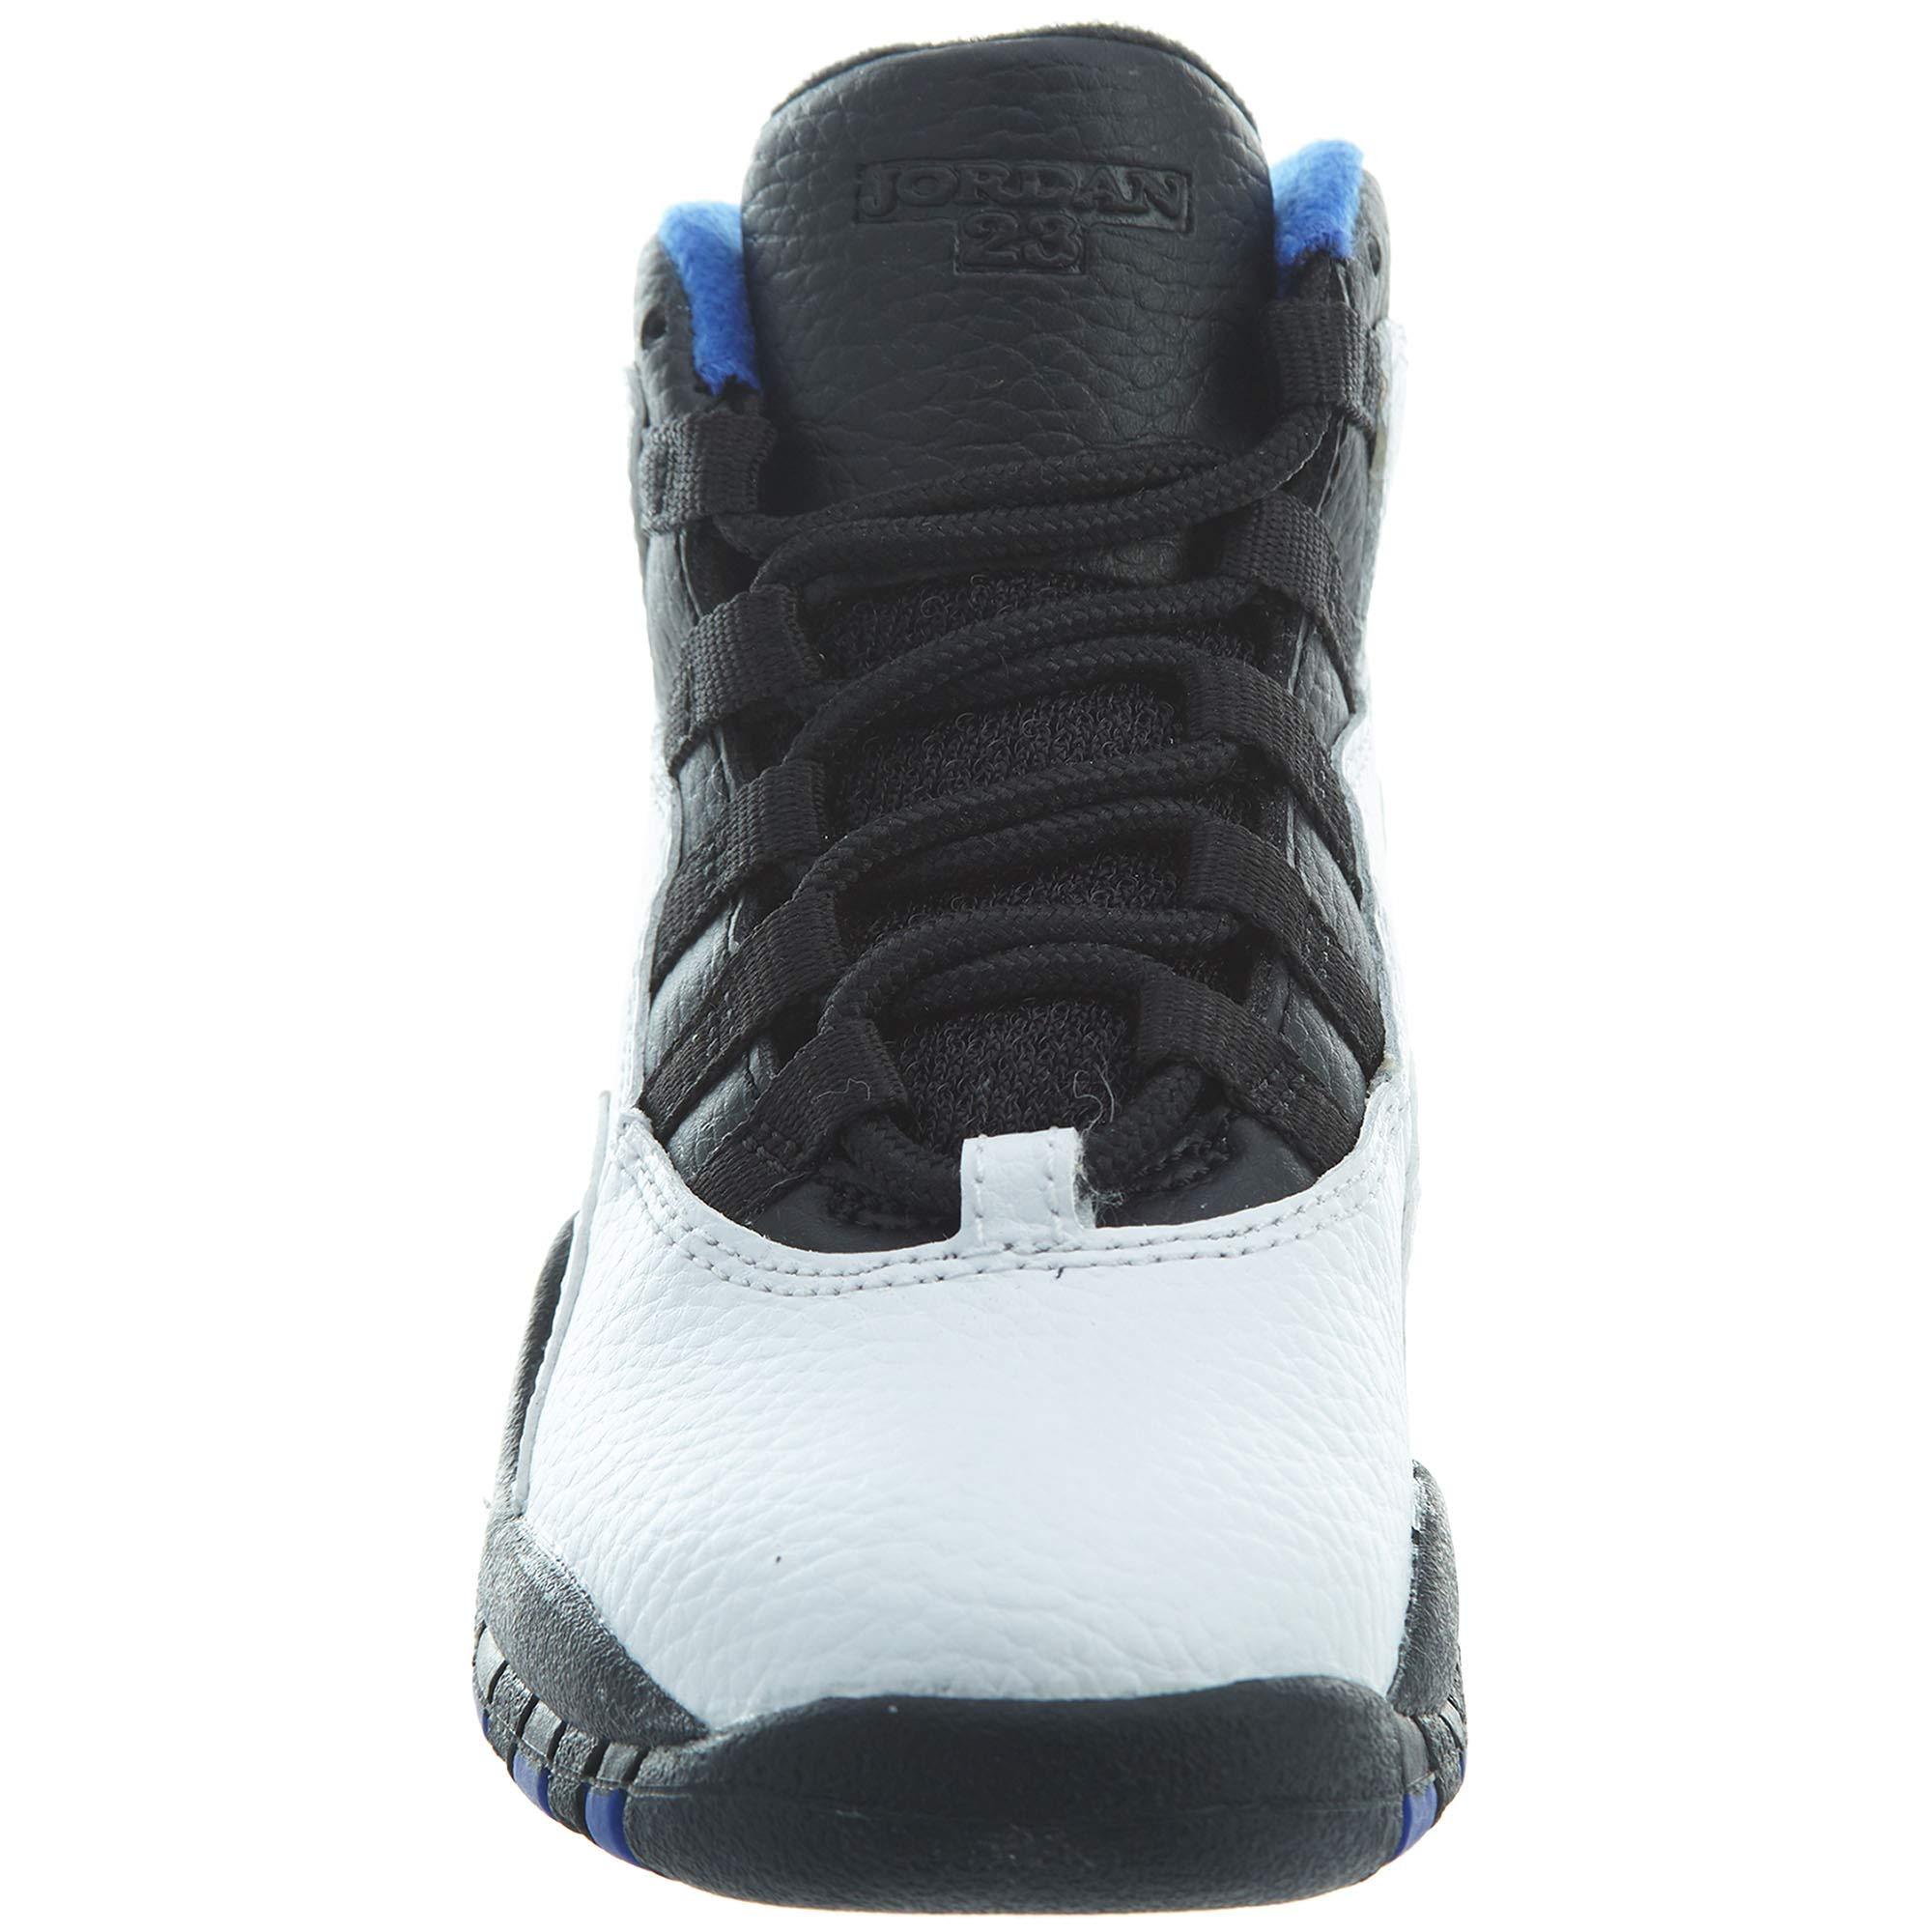 Jordan Air Retro 10''Orlando White/Black-Royal Blue (PS) (13 M US Little Kid) by Jordan (Image #2)